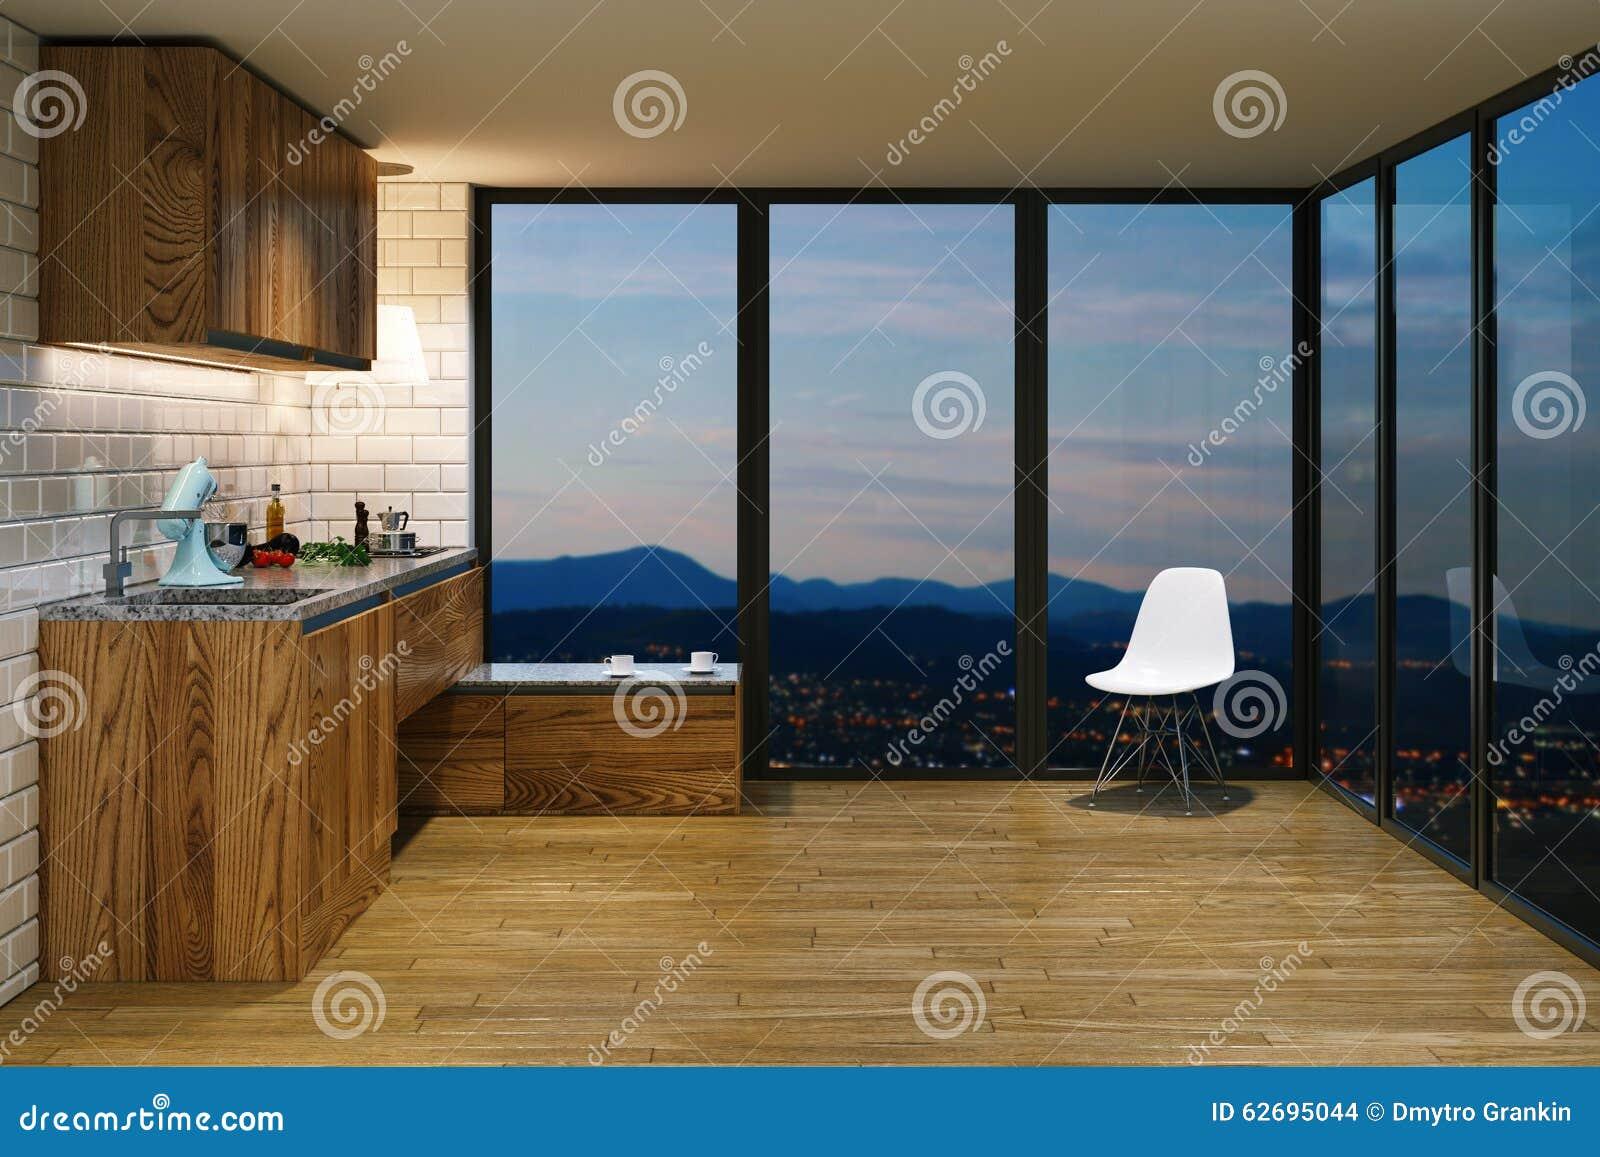 Wooden kitchen furniture in modern interior evening view from b